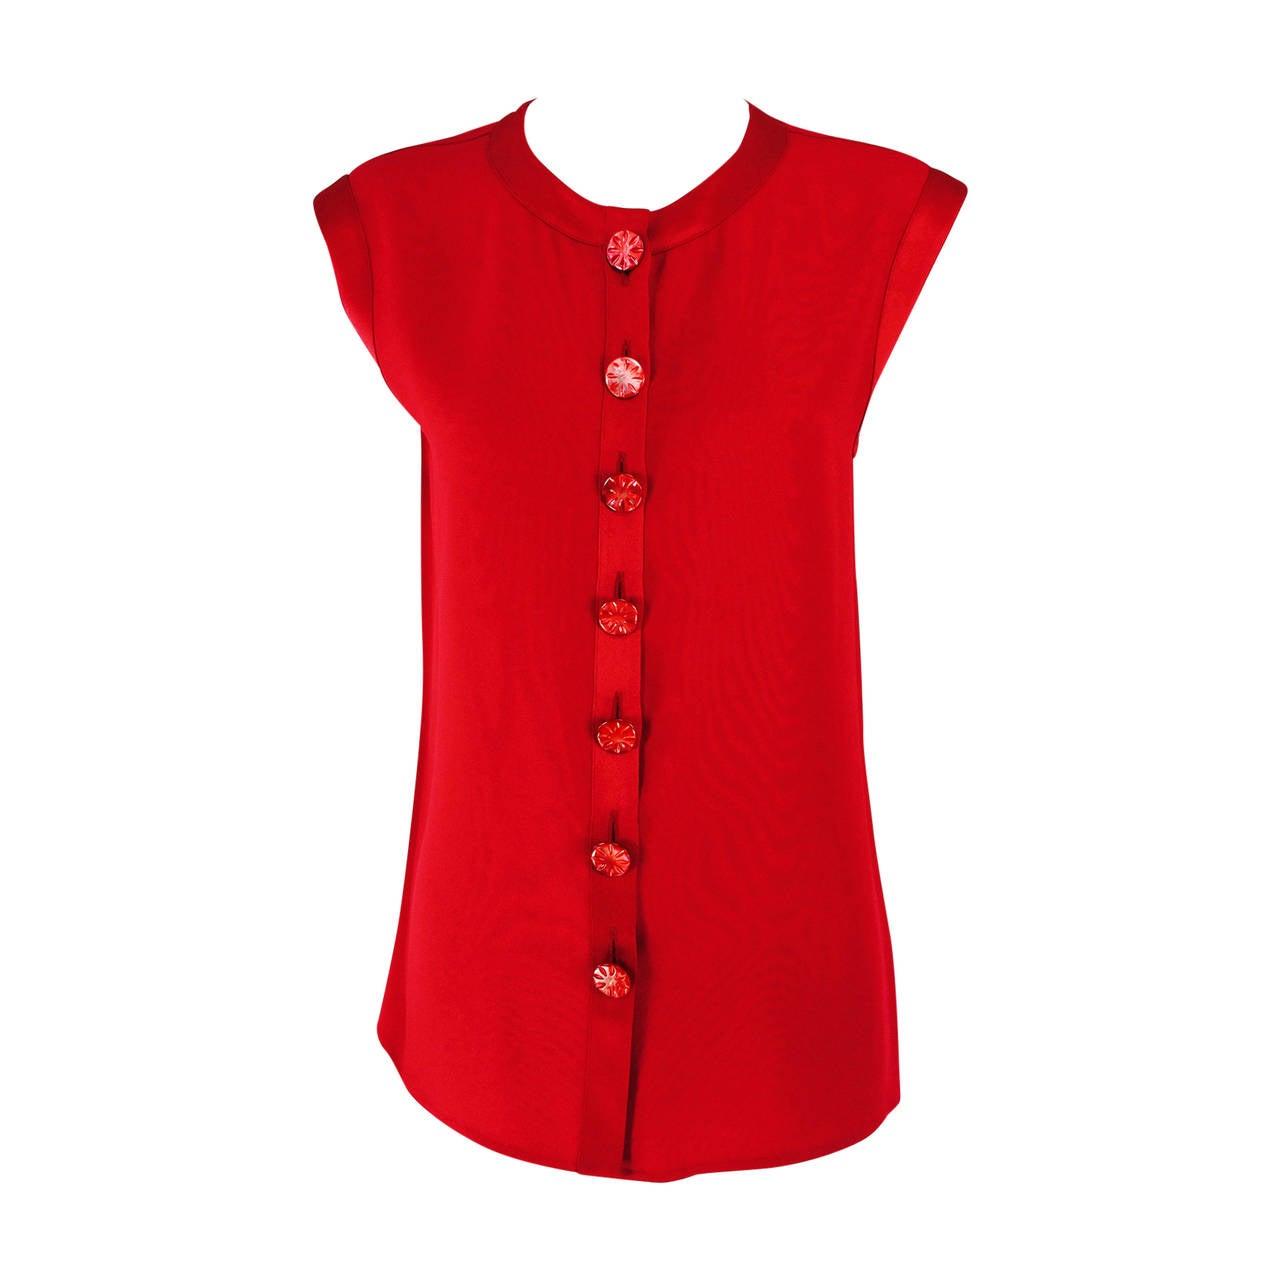 Yves St Laurent YSL Rive Gauche red satin back crepe sleeveless top 1